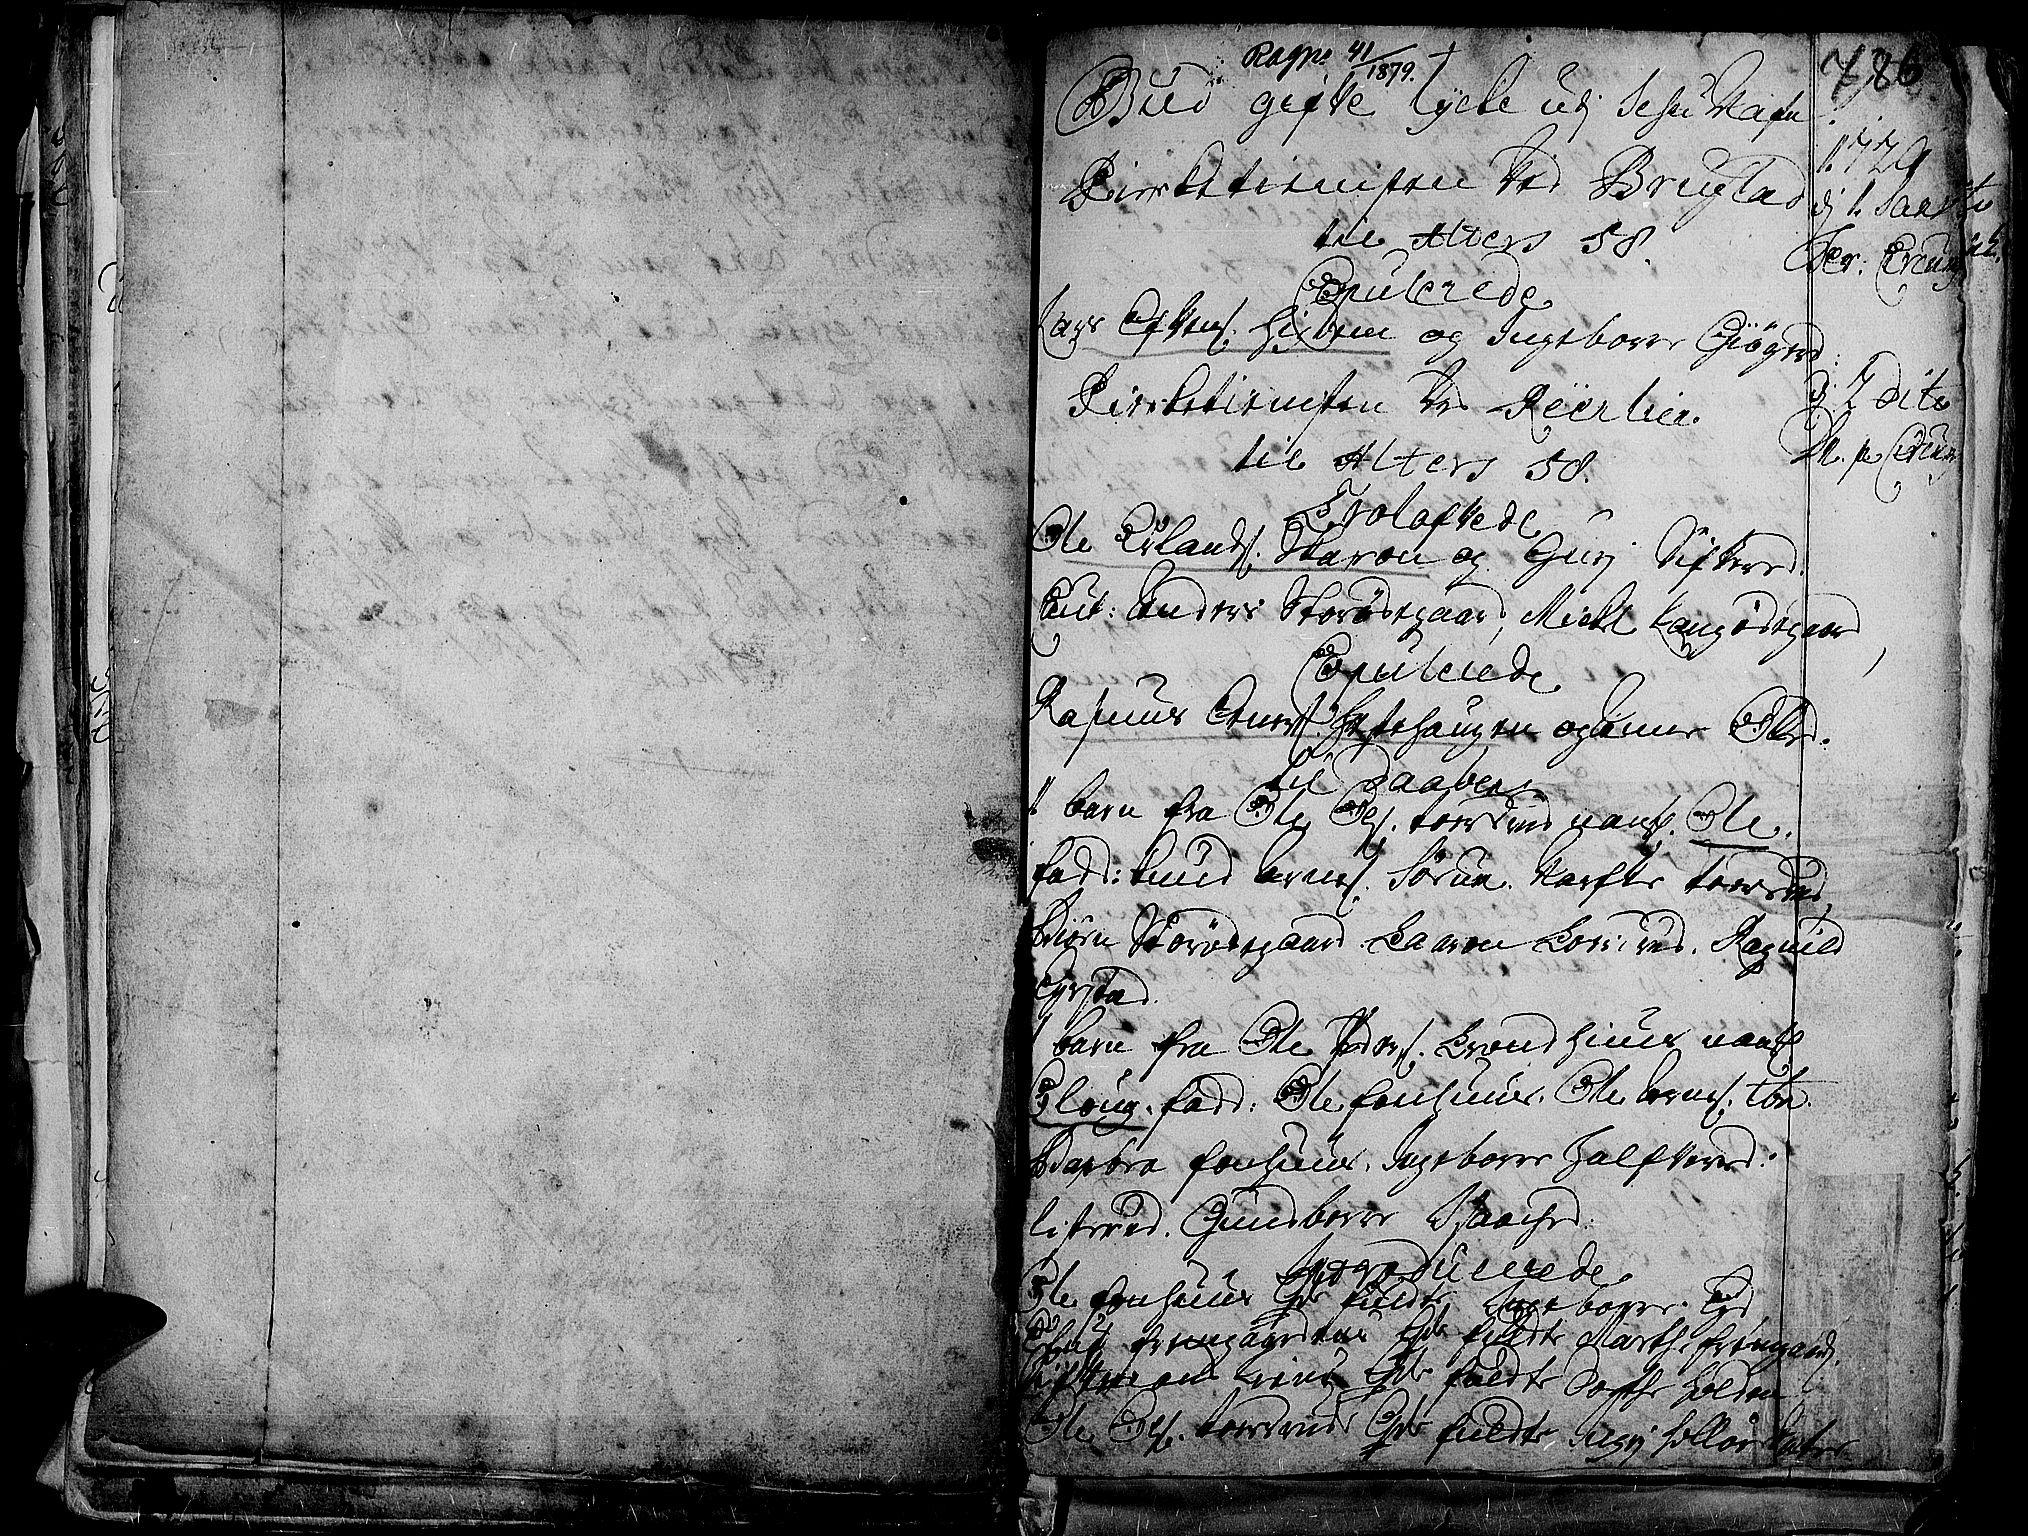 SAH, Aurdal prestekontor, Ministerialbok nr. 1-3, 1692-1730, s. 786